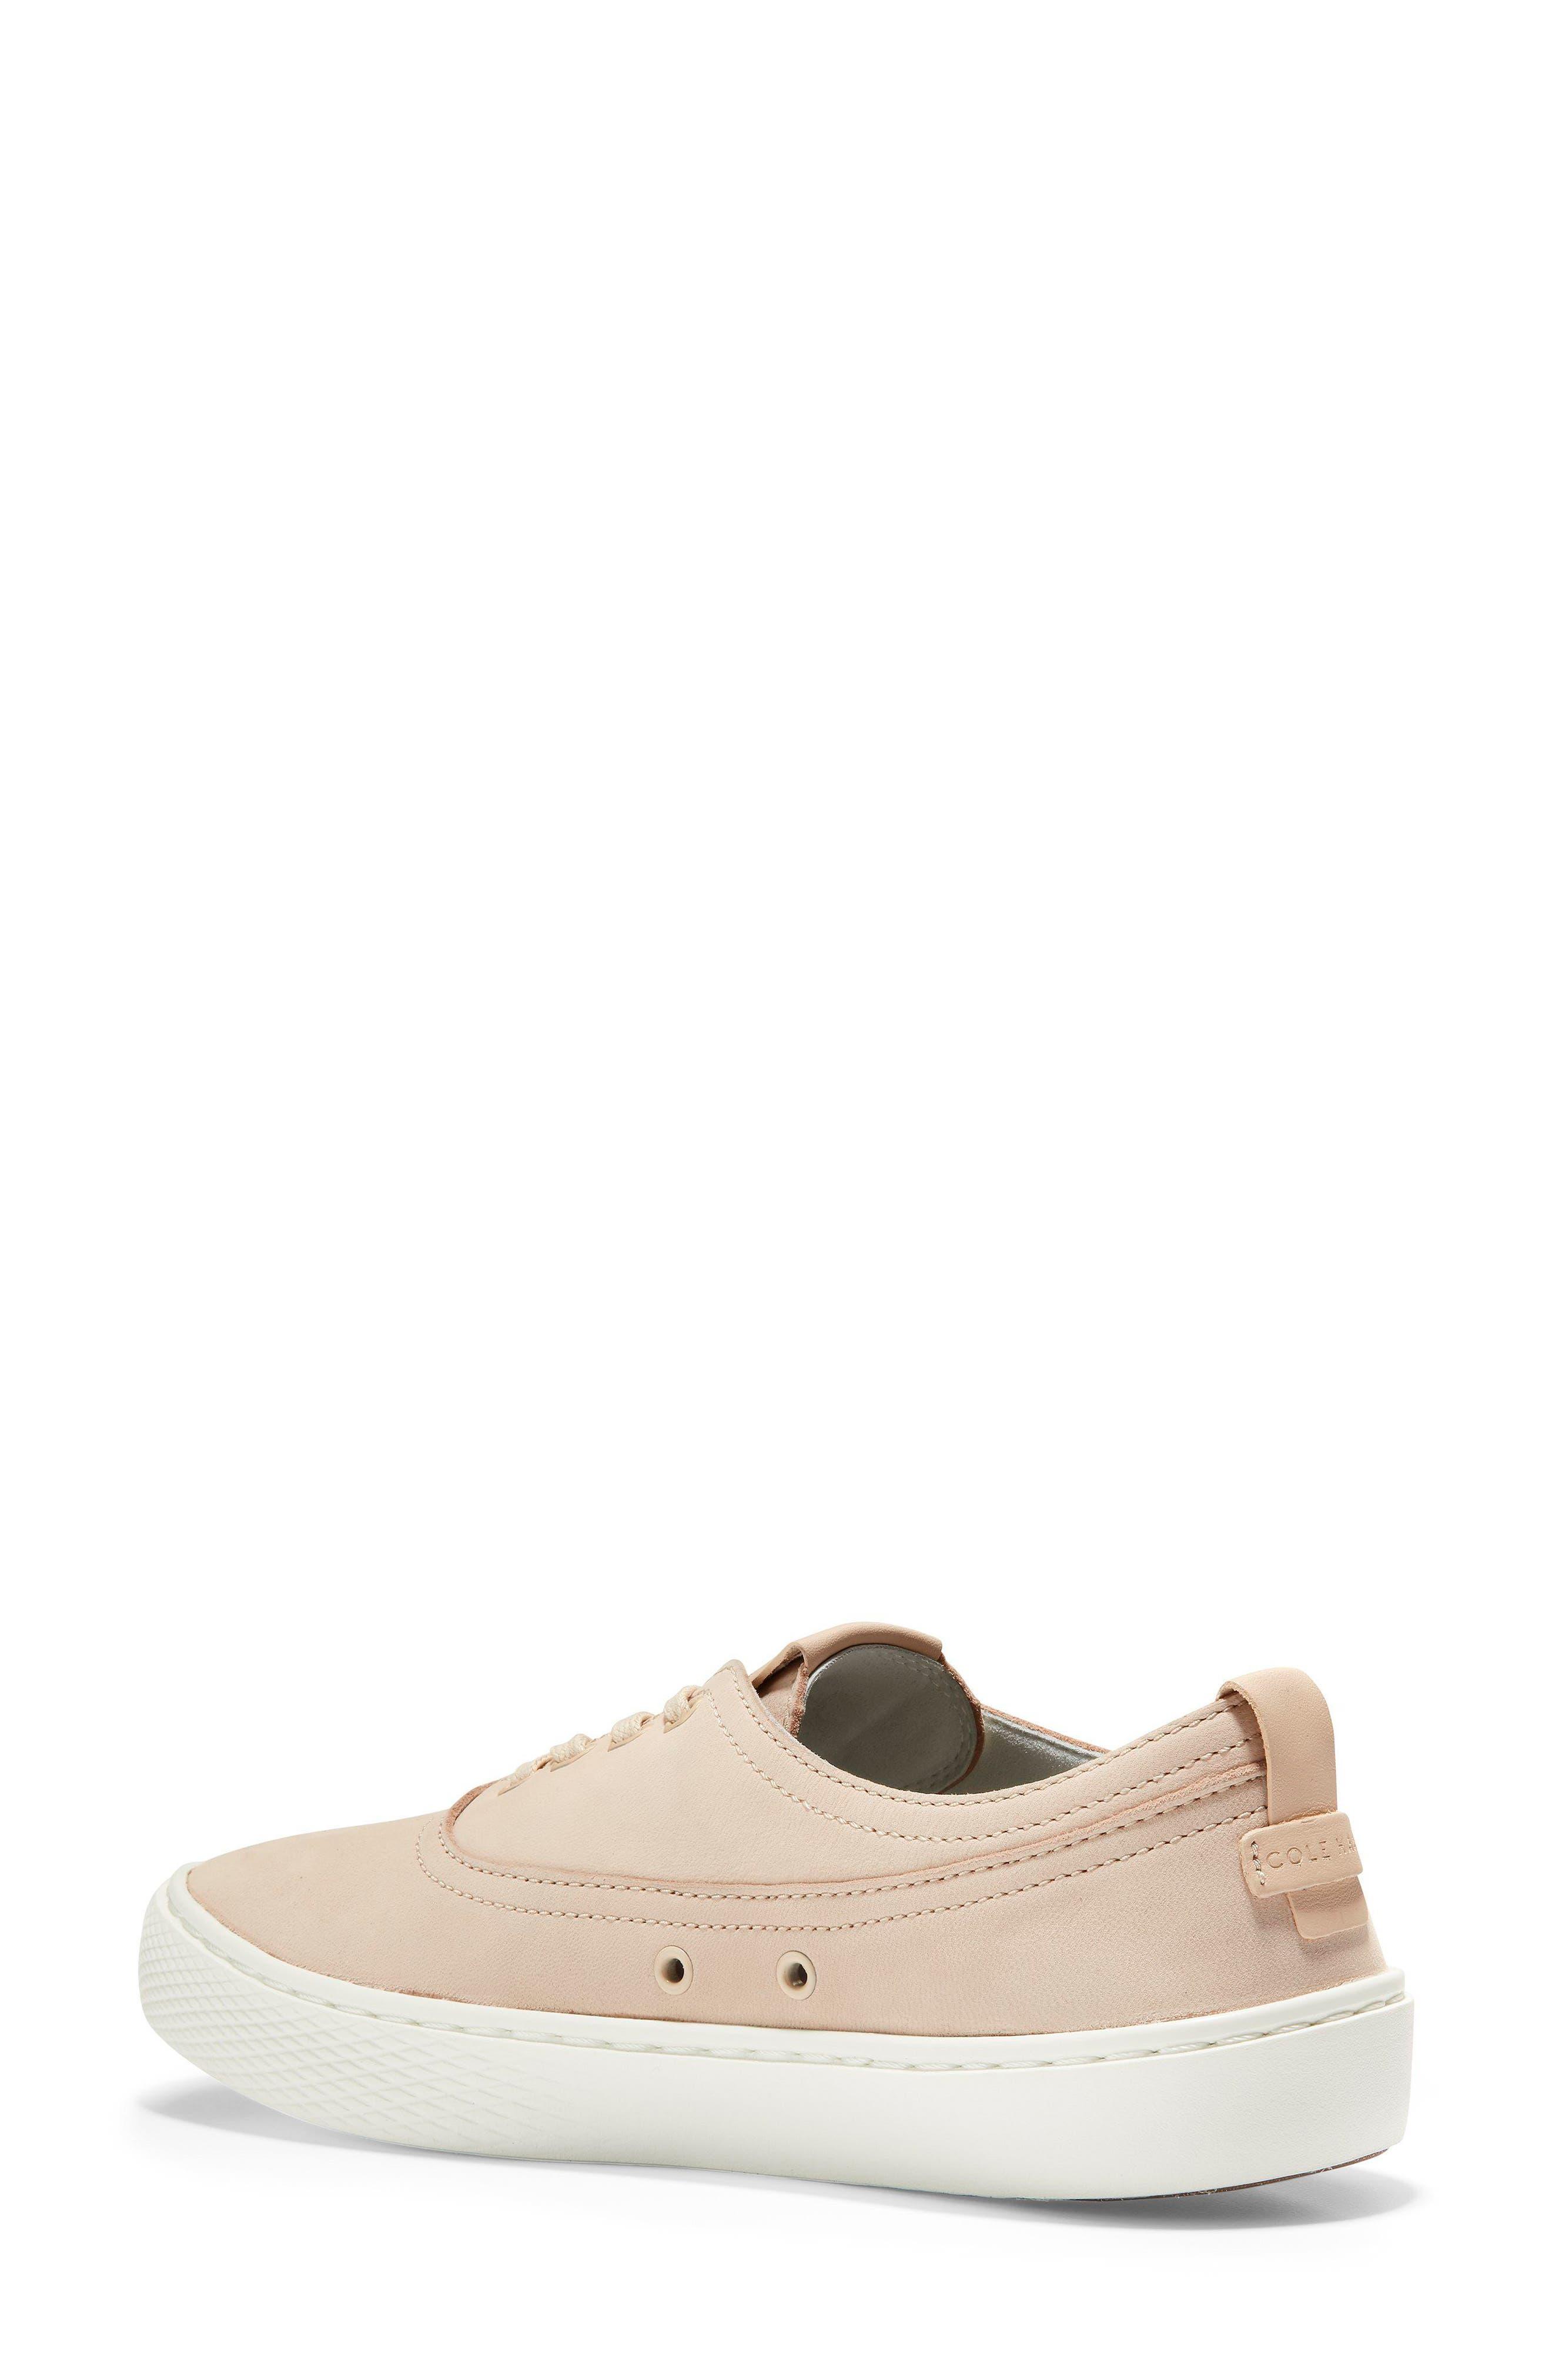 GrandPro Deck Sneaker,                             Alternate thumbnail 2, color,                             250